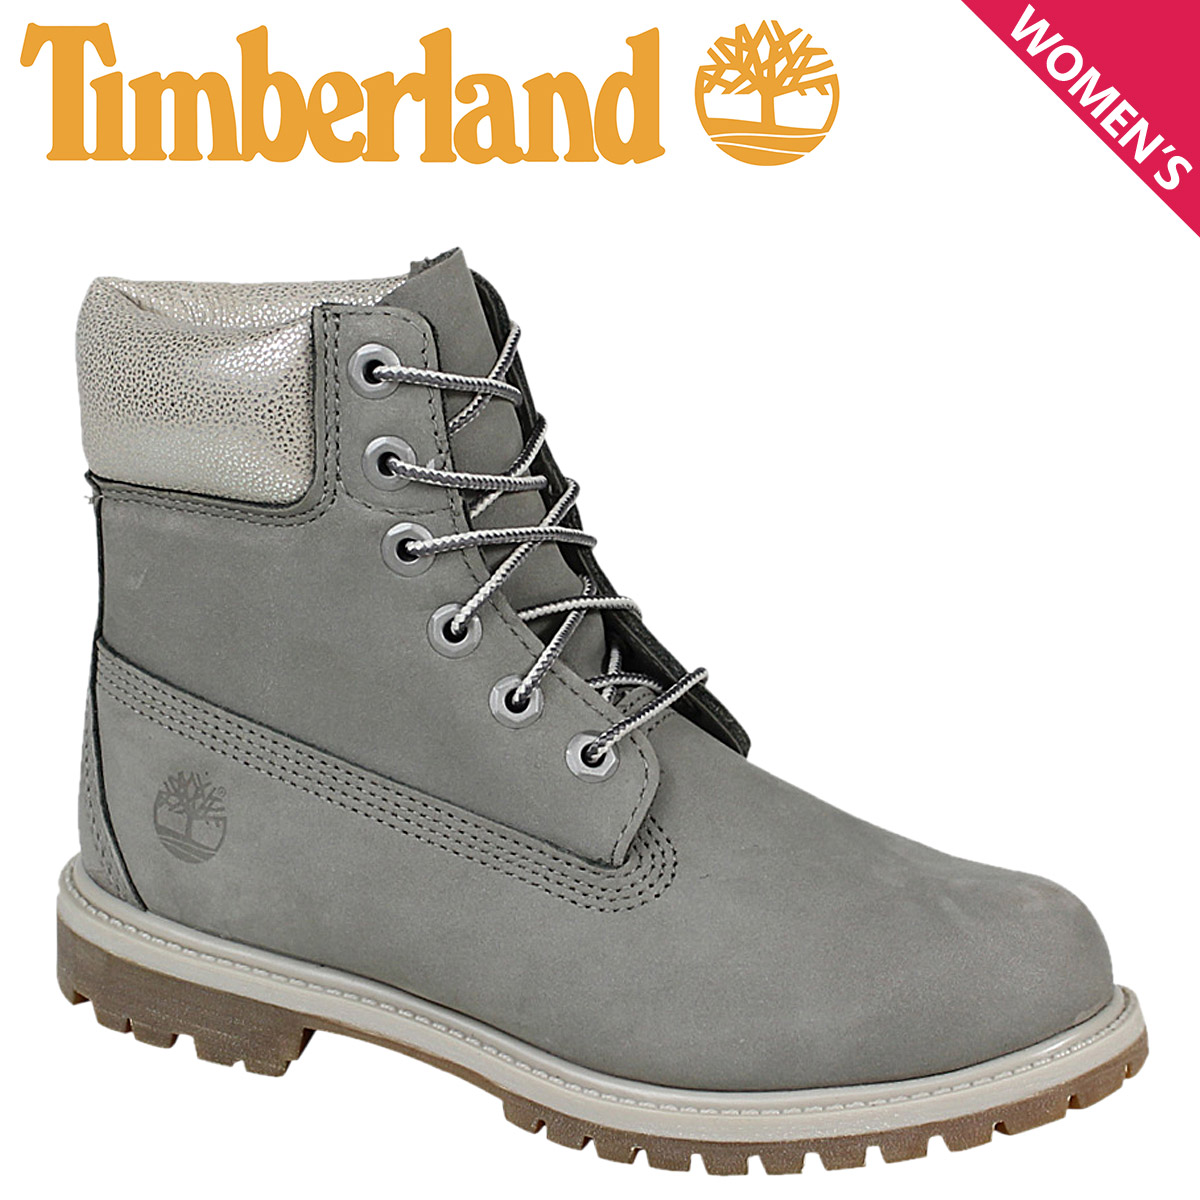 Women s Timberland Timberland 6 INCHI 6 inch premium boots JUNIOR 6-INCH  PREMIUM WATERPROOF BOOTS A196J W wise waterproof grey 9579980985